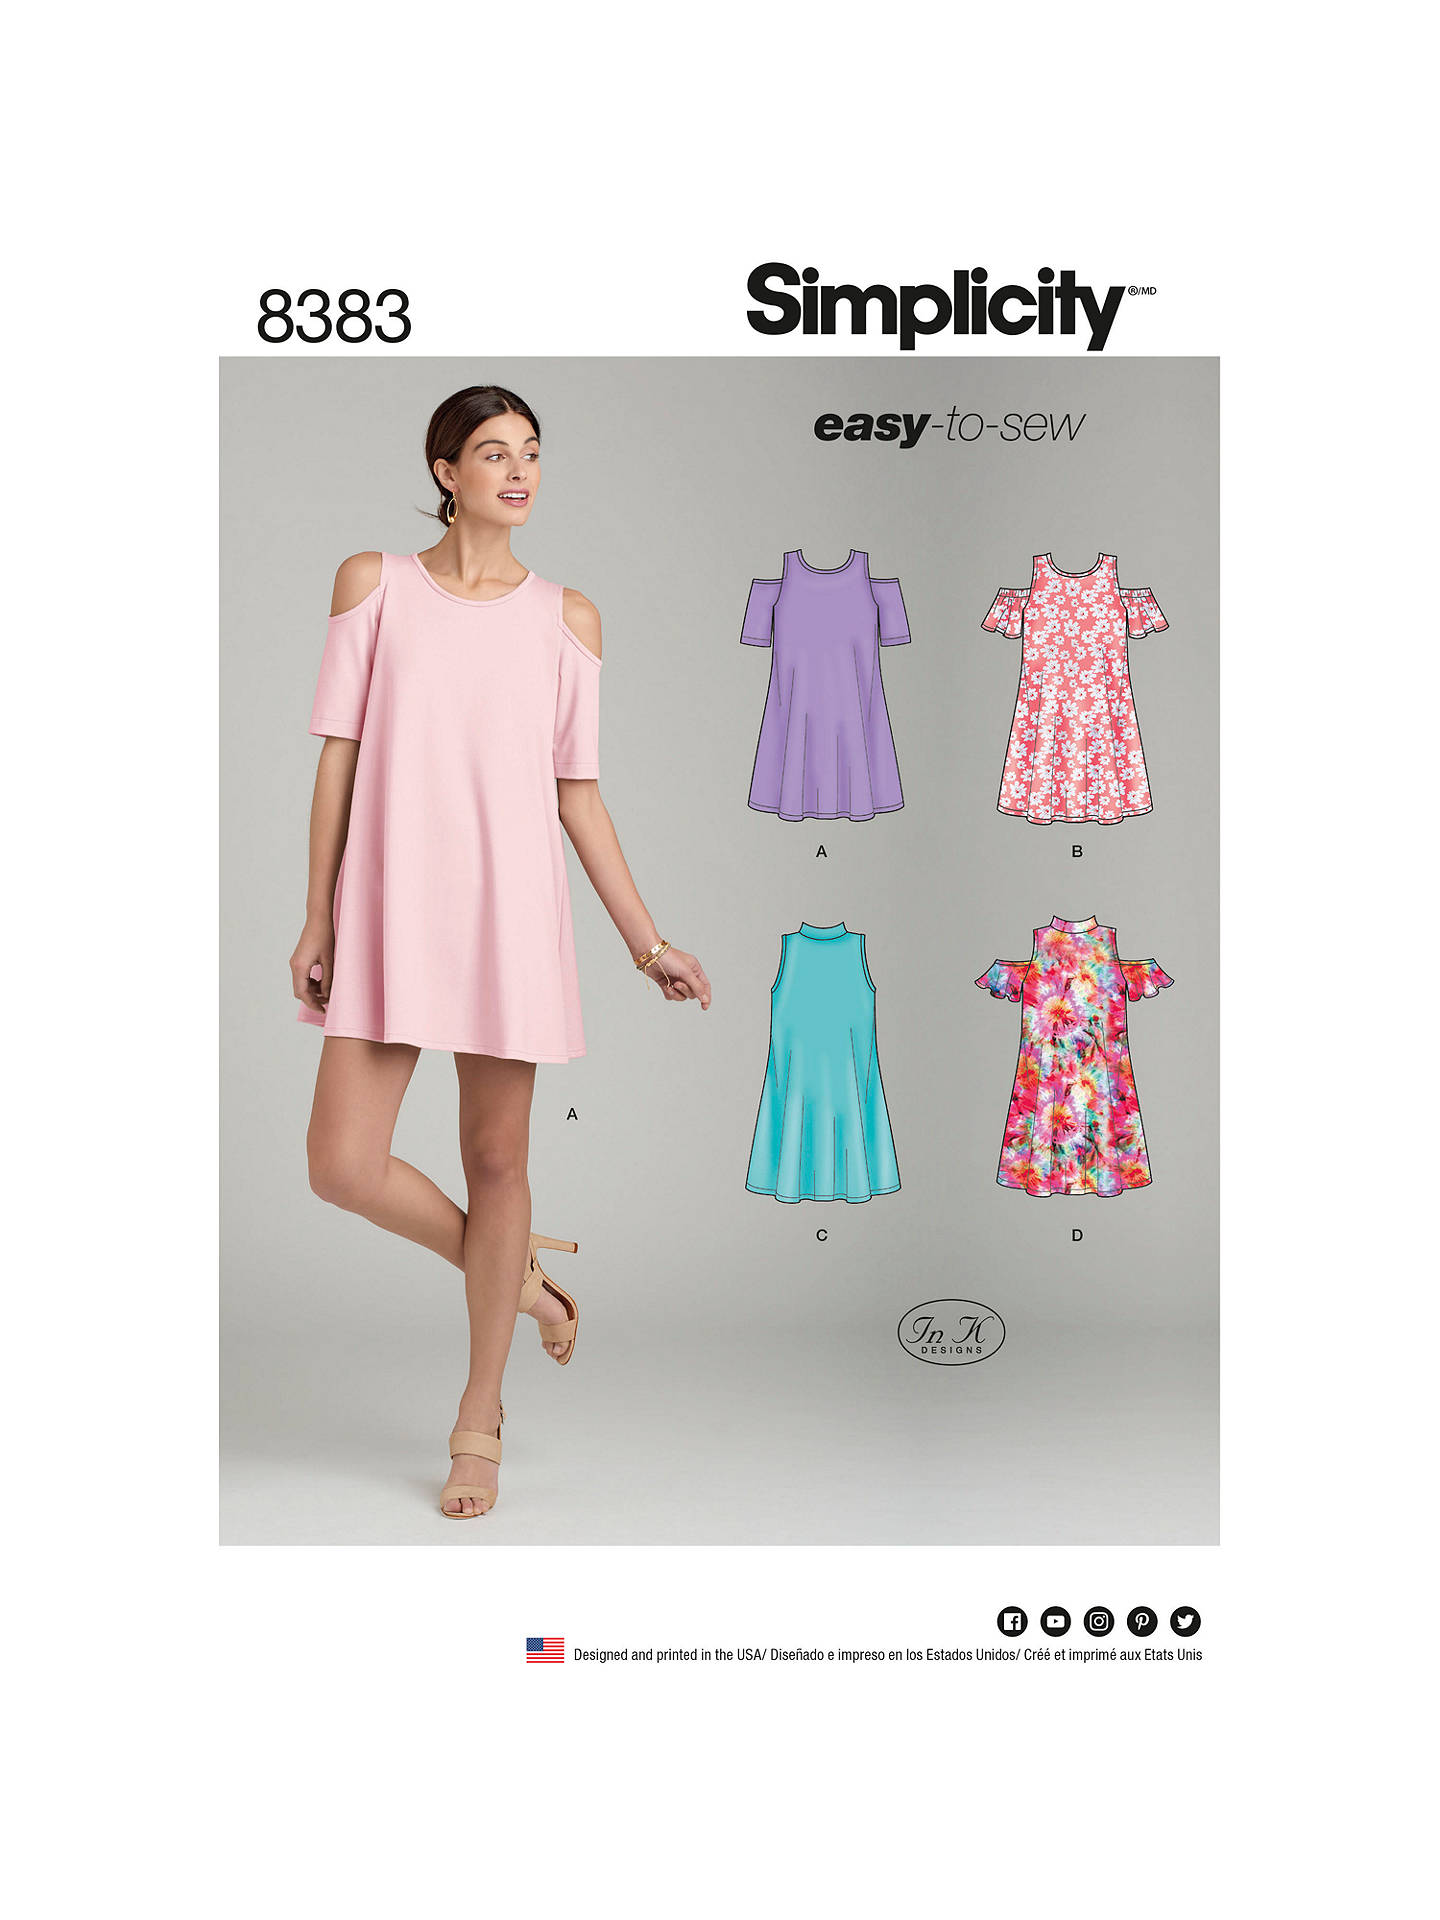 d327489f0f8 Simplicity Maternity Dress Patterns Uk